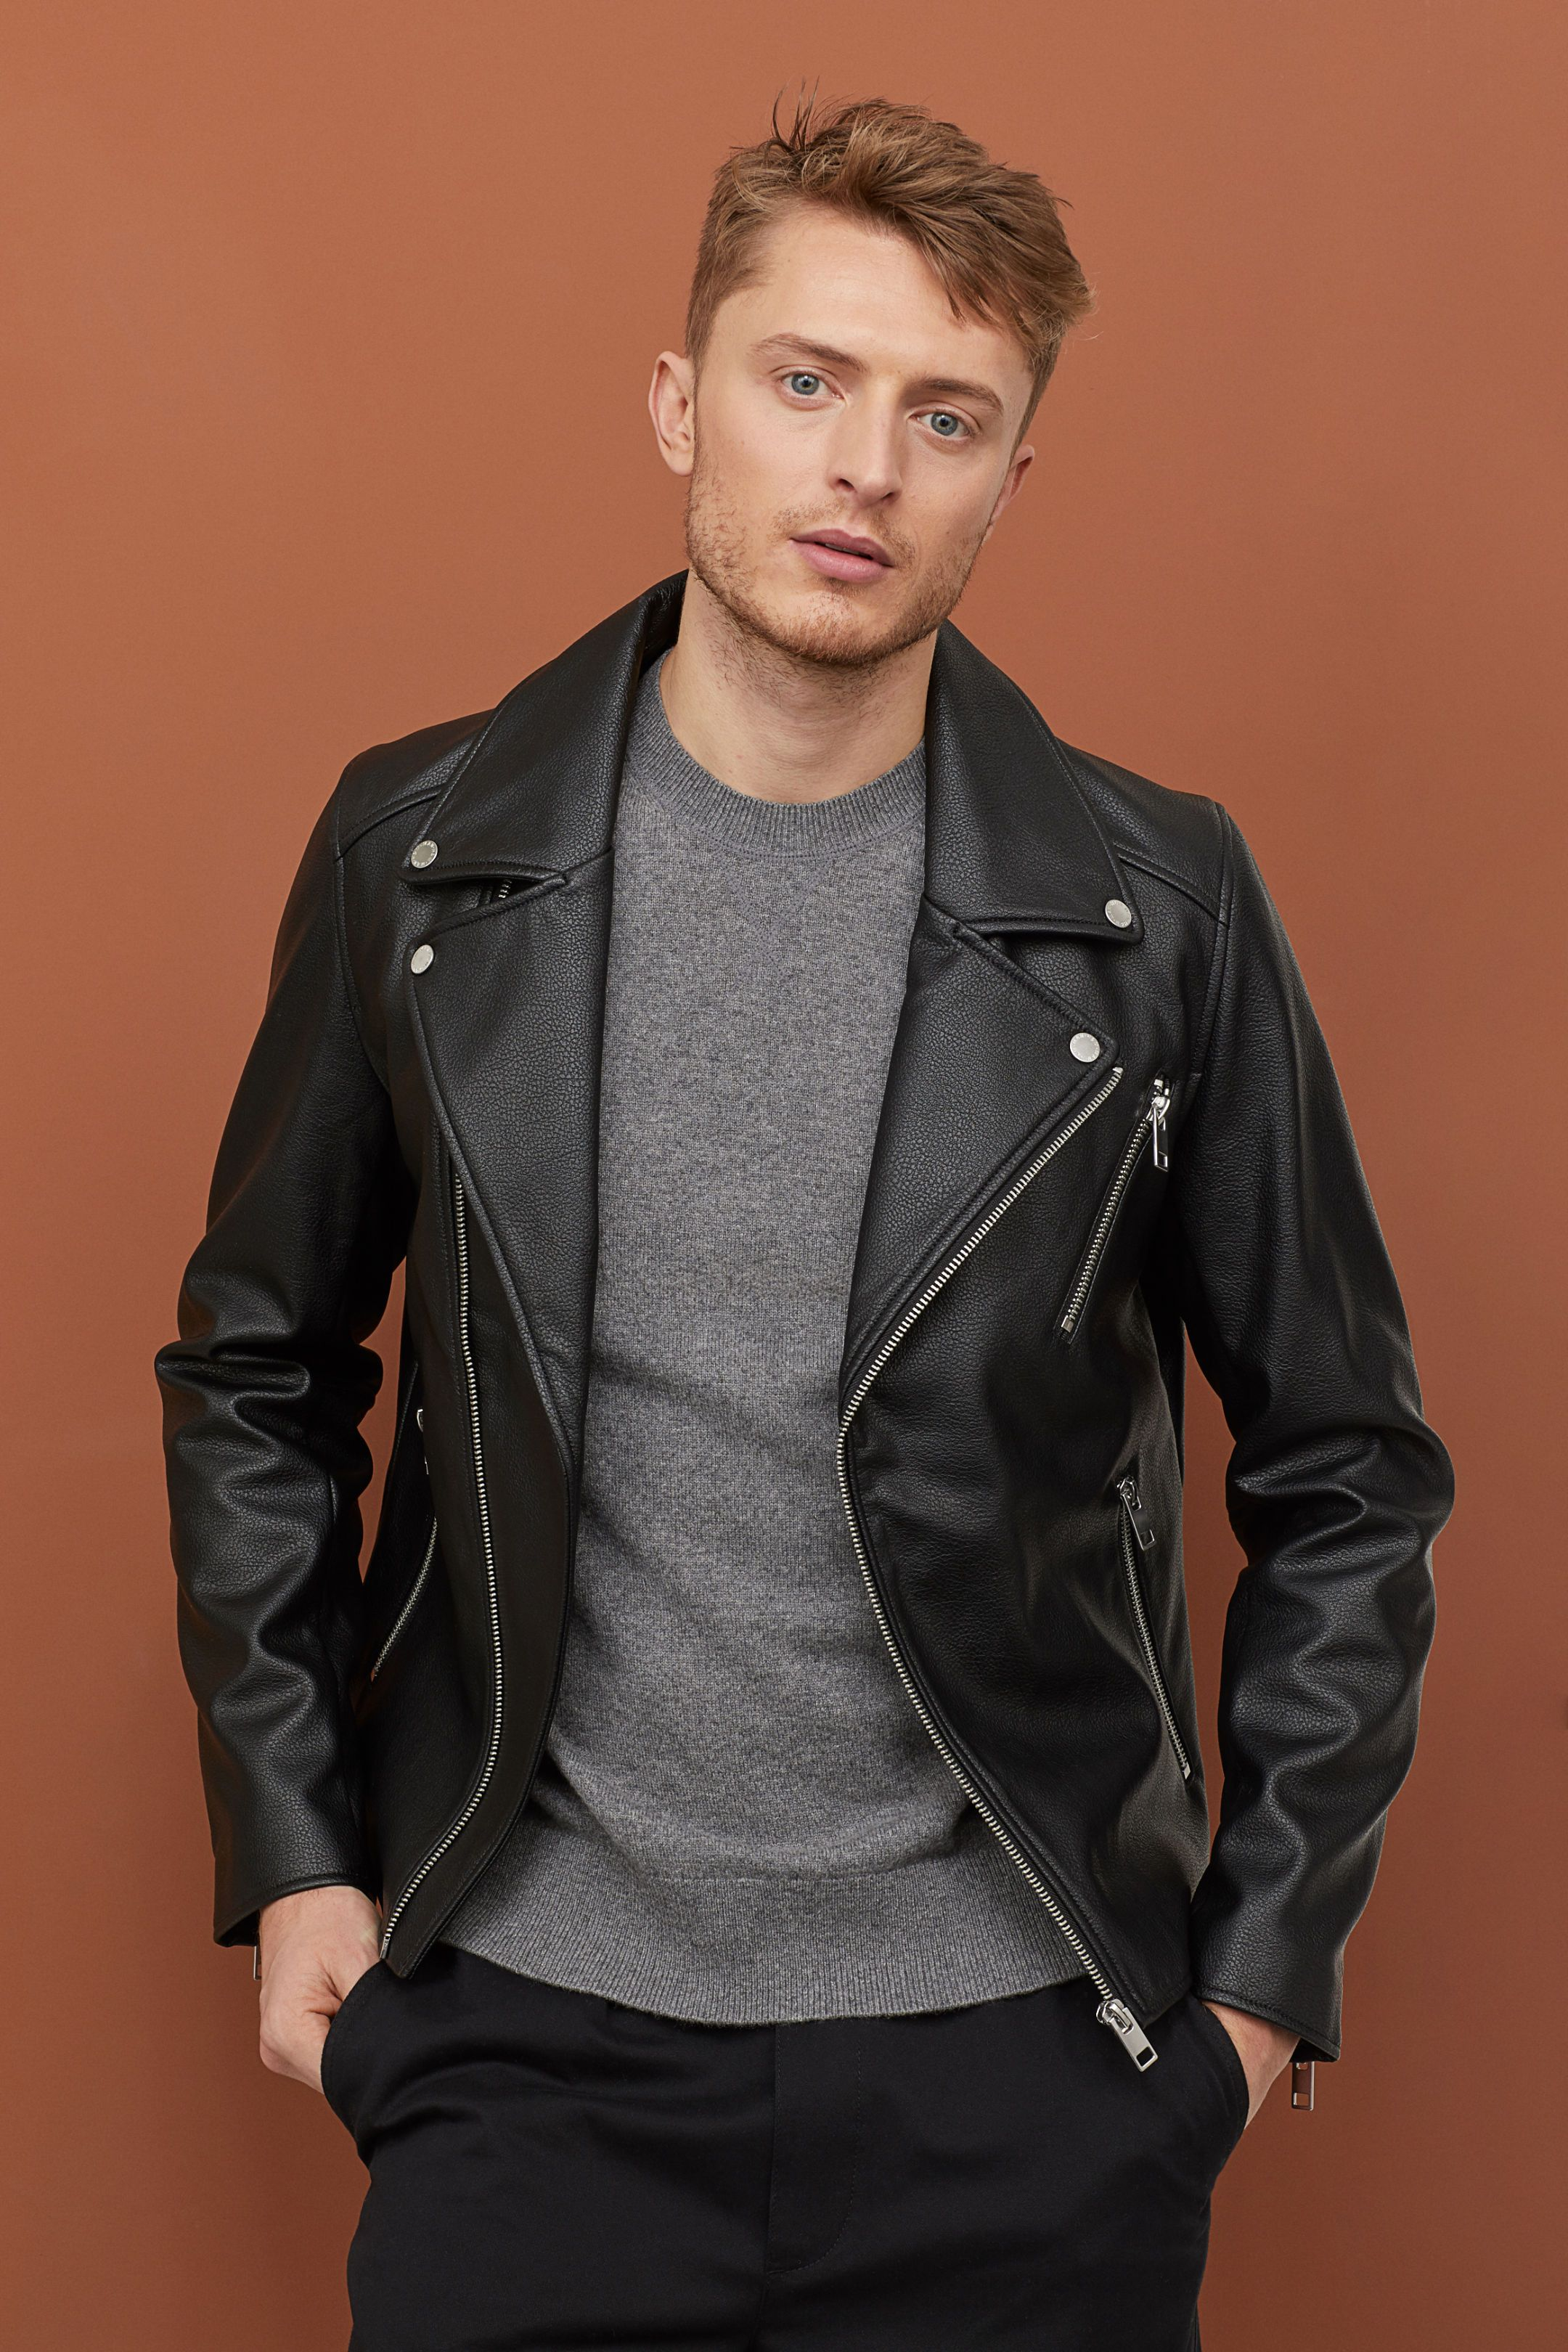 Biker Jacket Leather jacket men, Leather jacket outfit